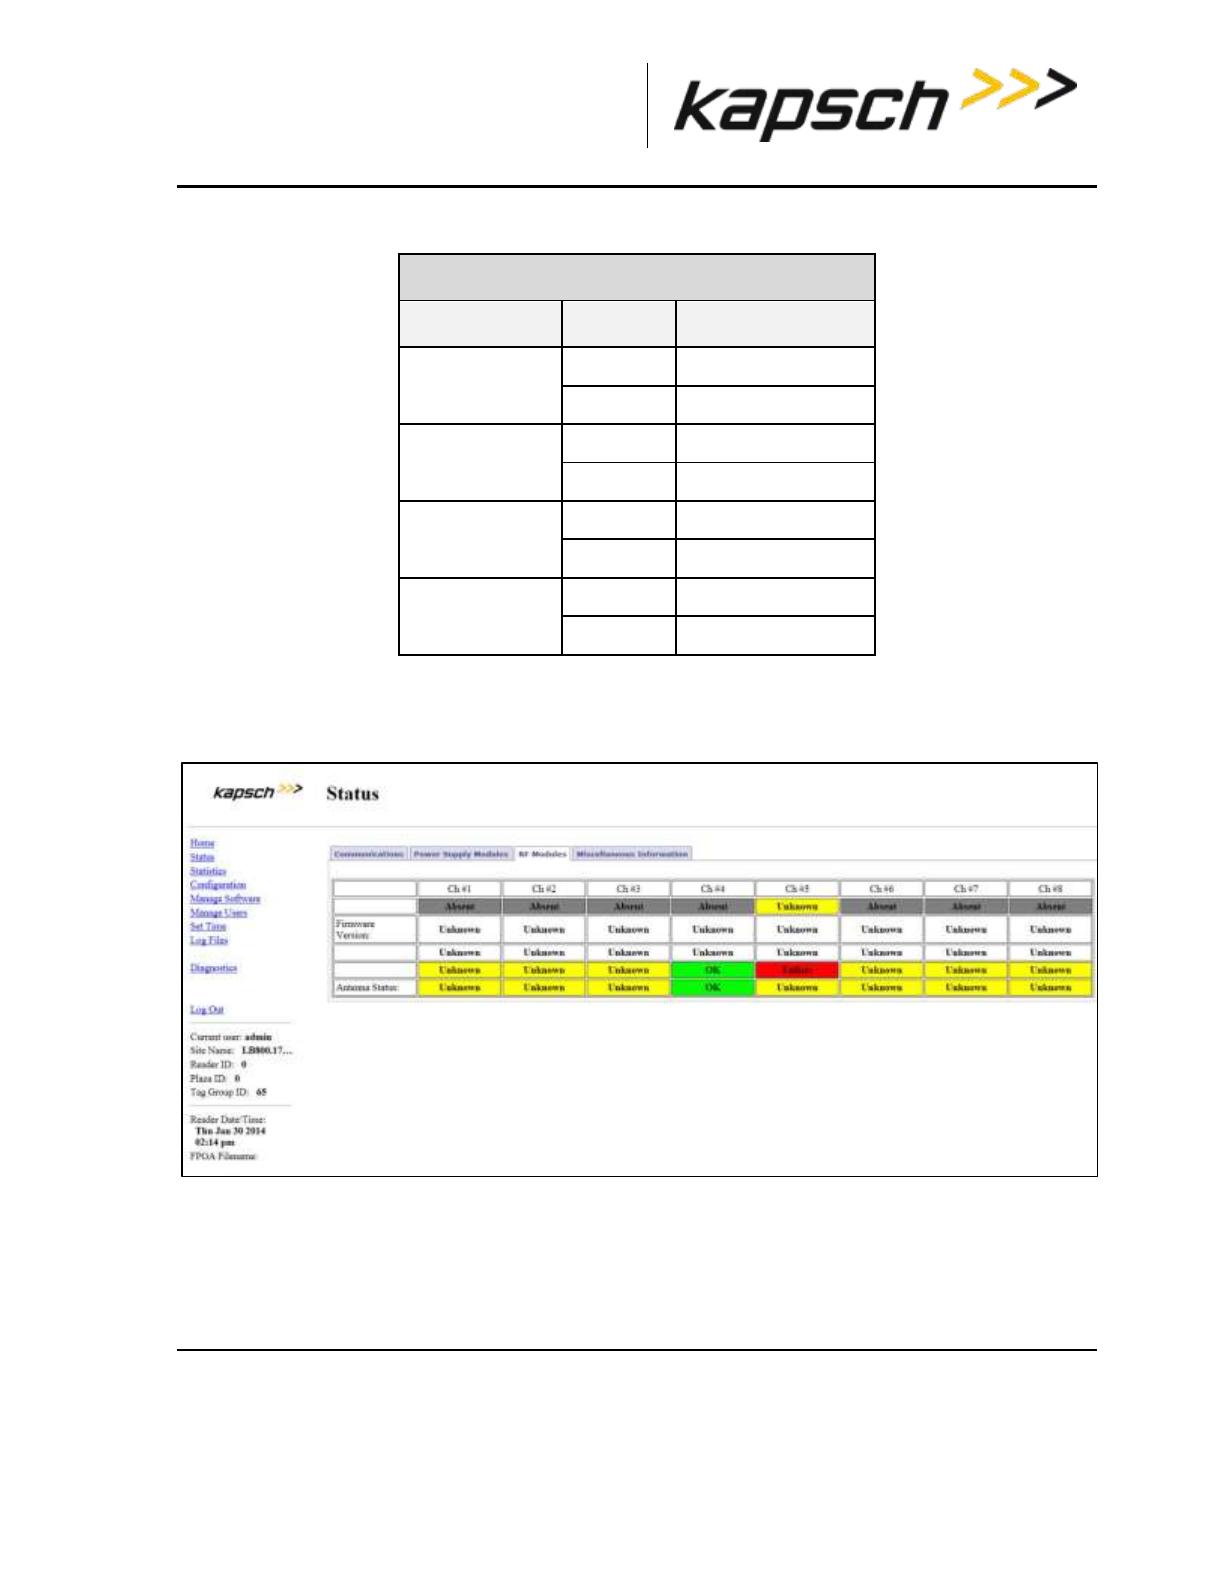 Kapsch Trafficcom Canada 802295a Non Multilateration Lms Transmitter Scr Firingangle Control Circuit Diagram Tradeoficcom And Receiver User Manual Operator Maintenance